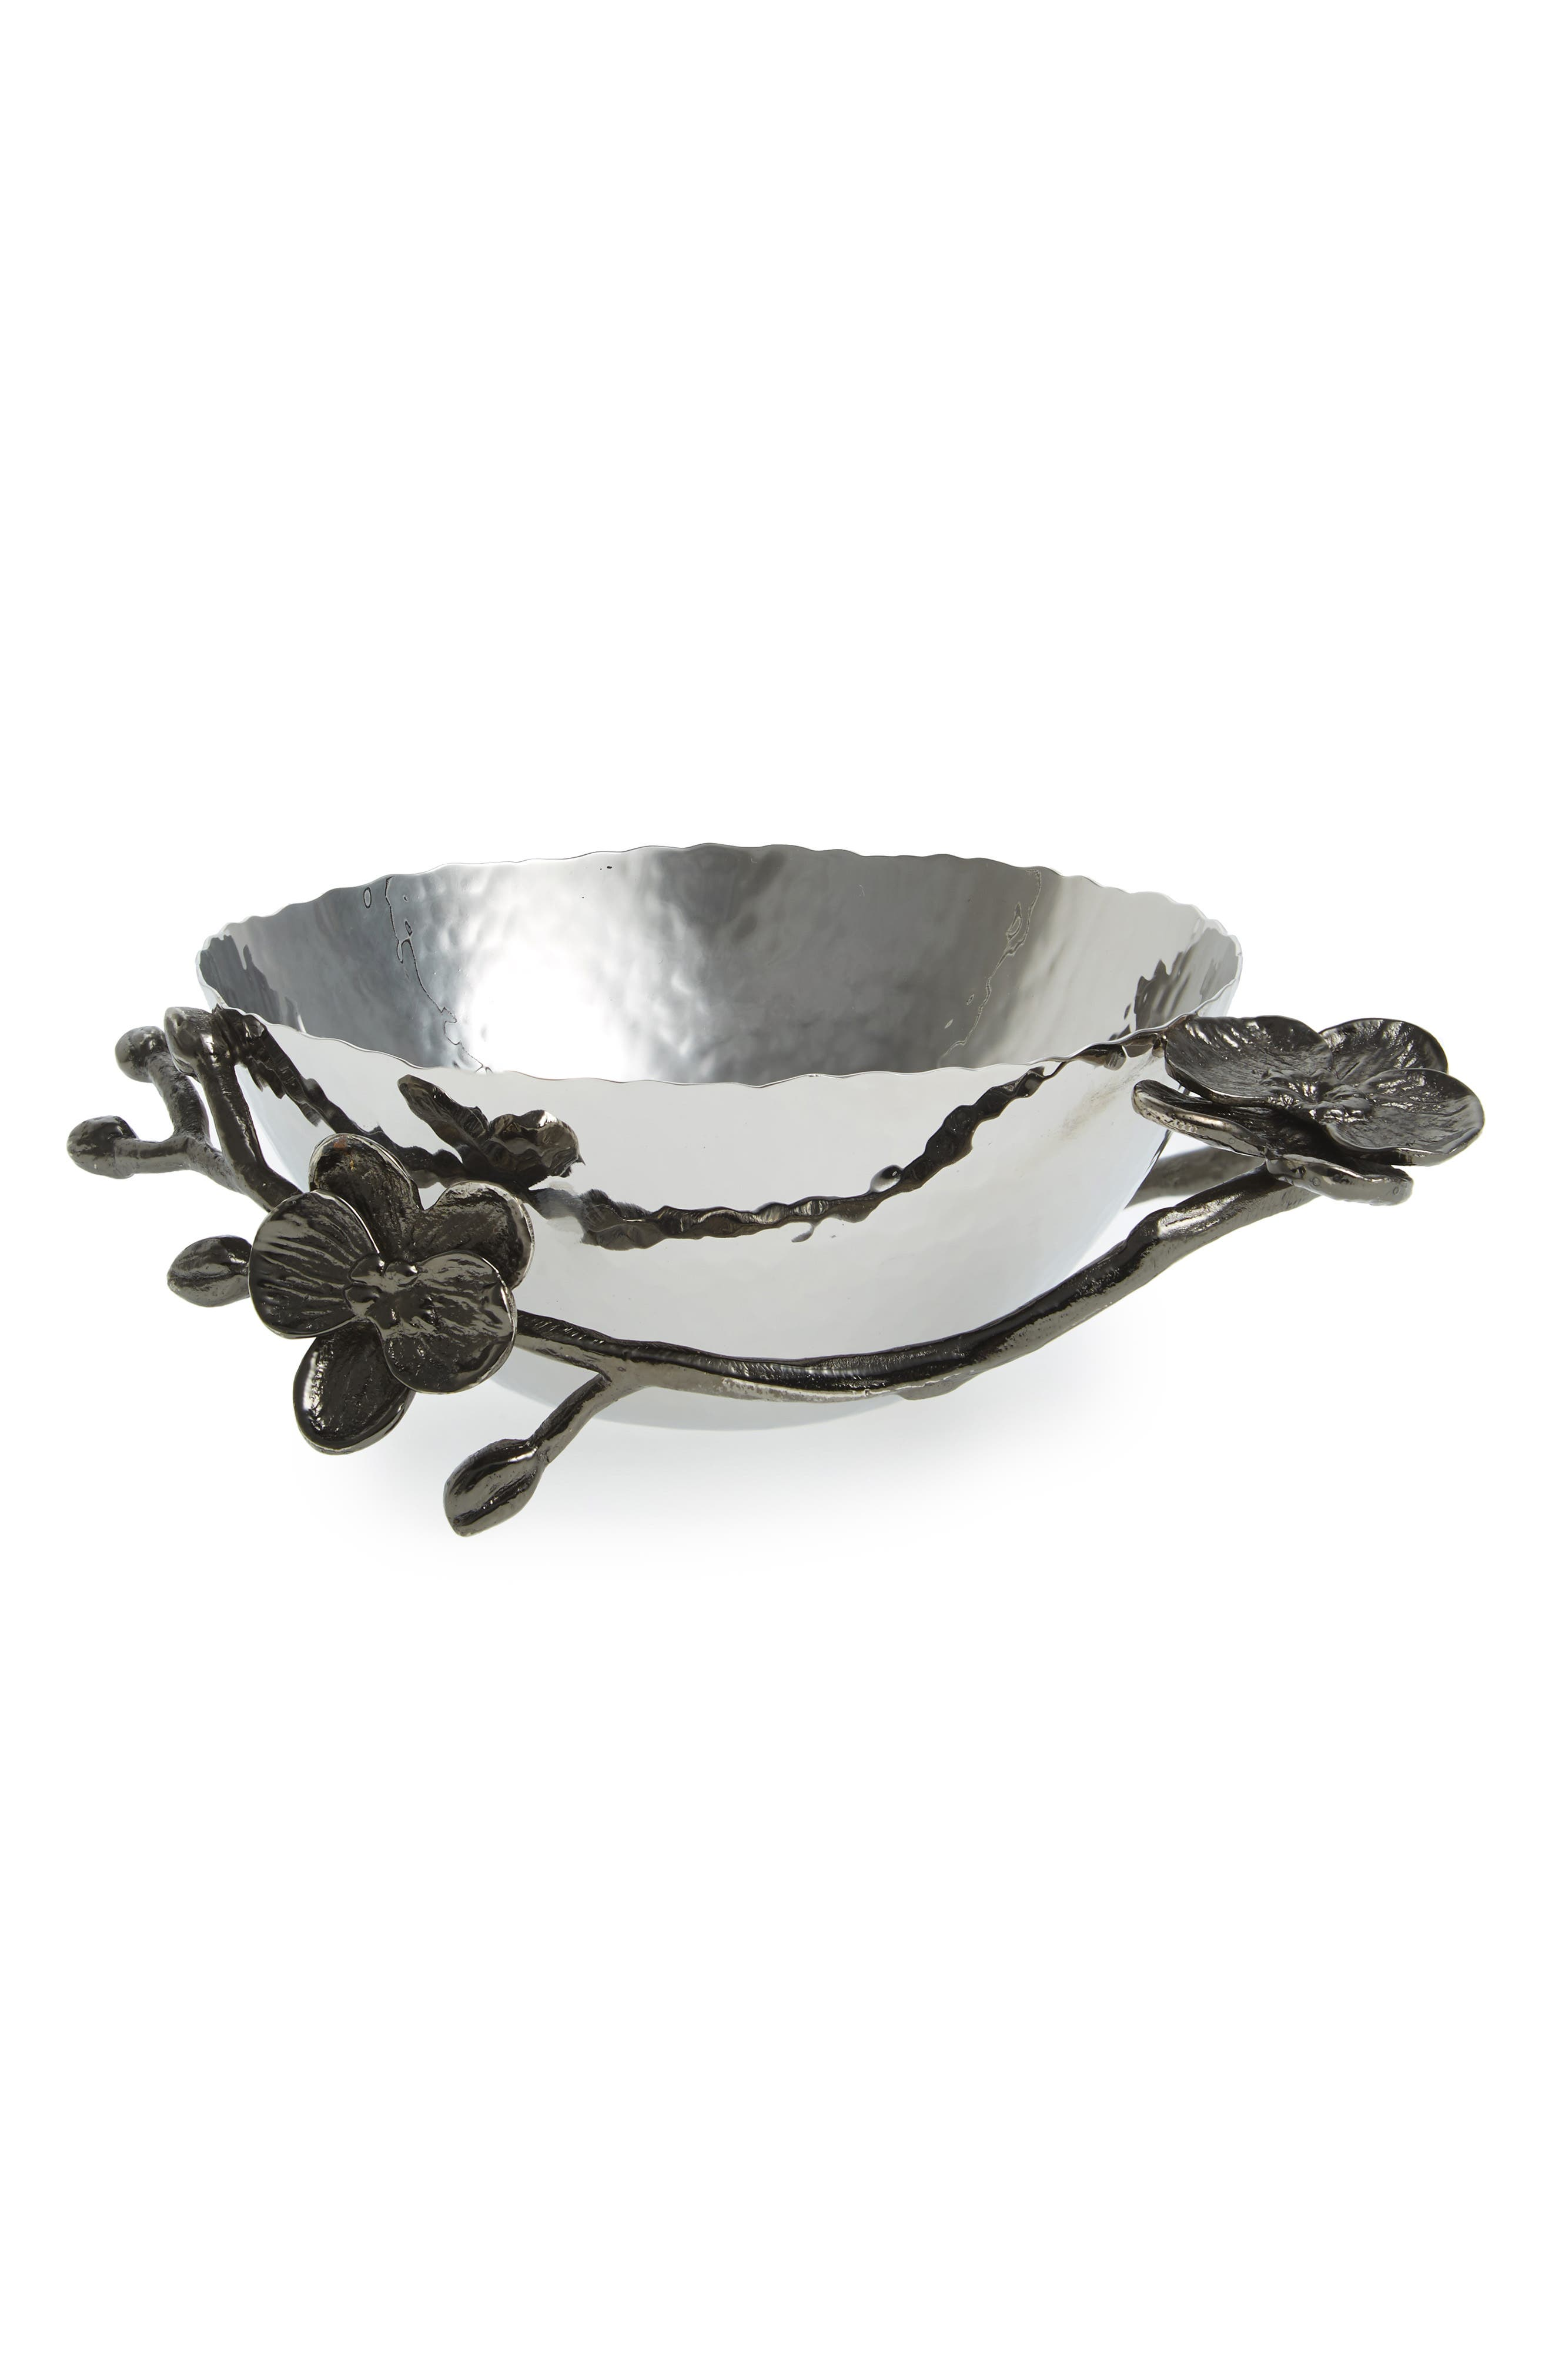 MICHAEL ARAM 'Black Orchid' Nut Bowl, Main, color, Black Nickel